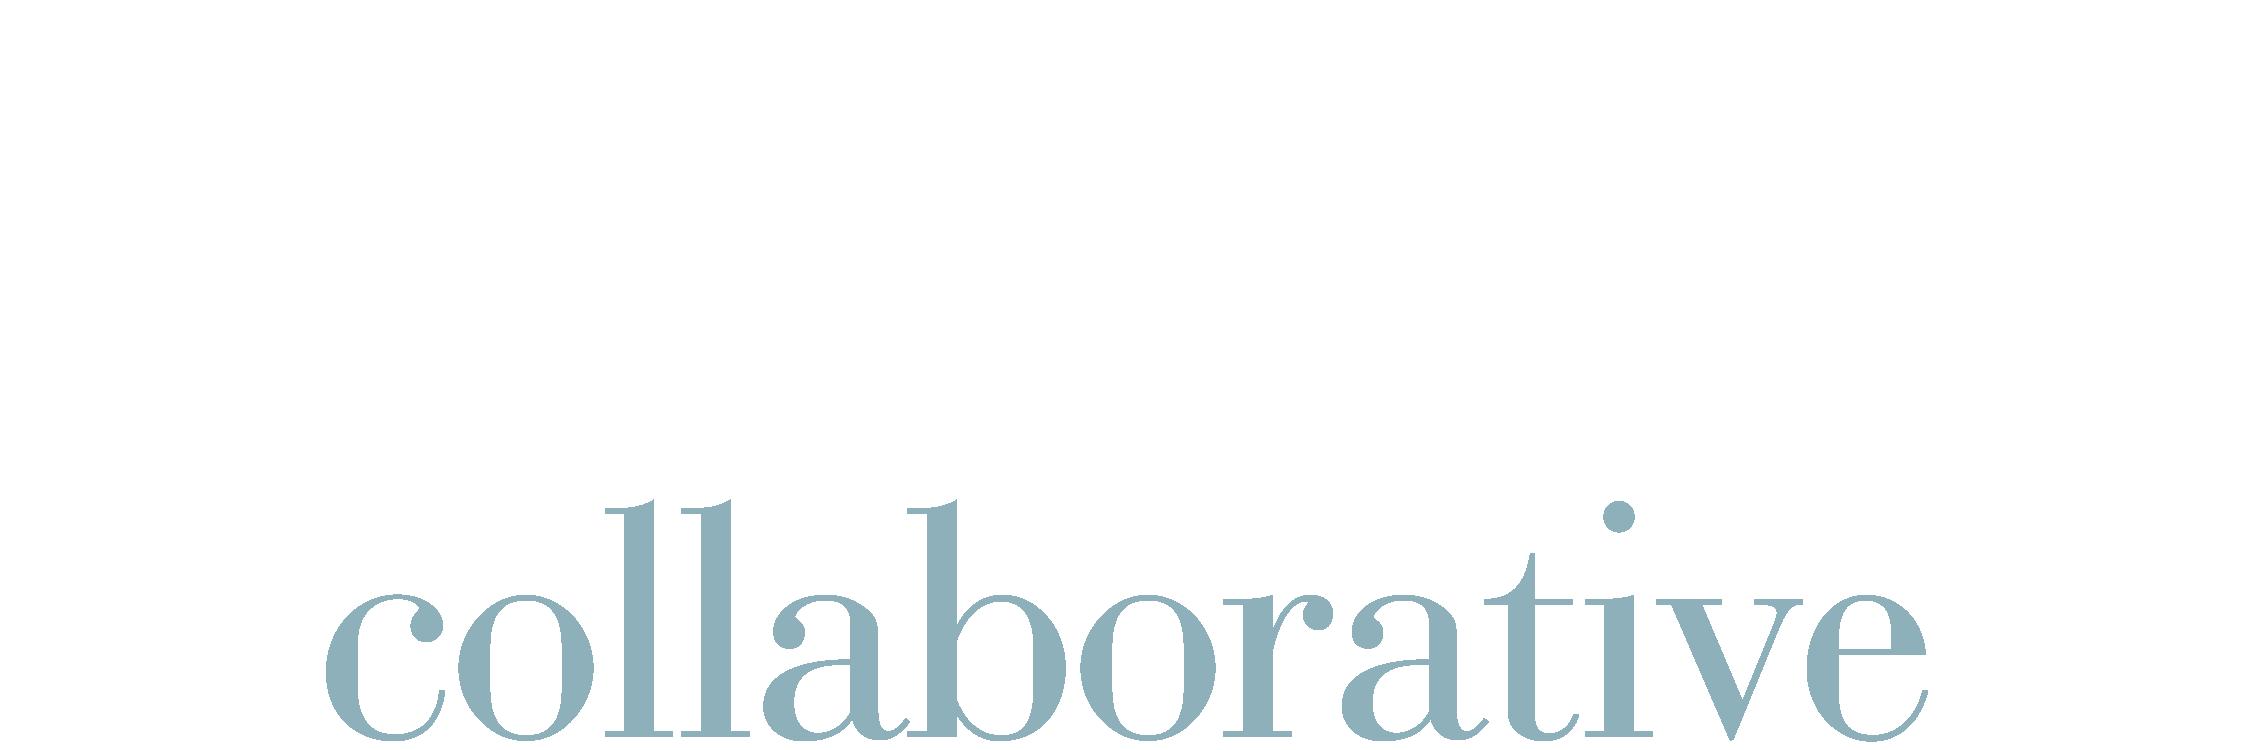 KidsFirstCollaborative_HalfWhite-HalfColor.png